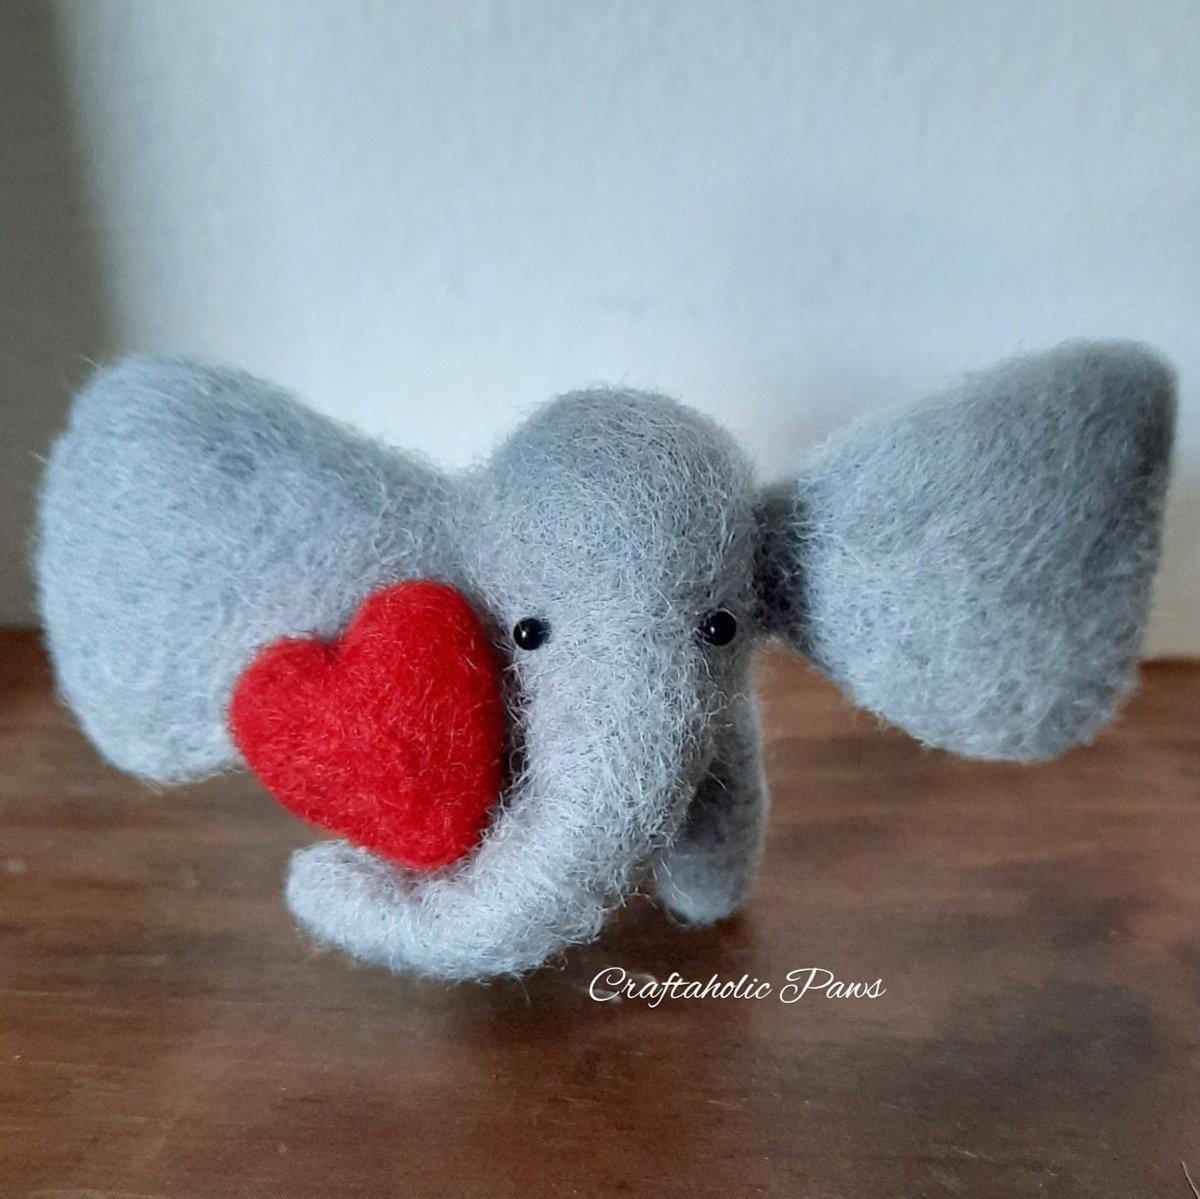 Sending some elephant love out #elevenseshour #elephants #cuteanimals pic.twitter.com/ILaRarEYcN